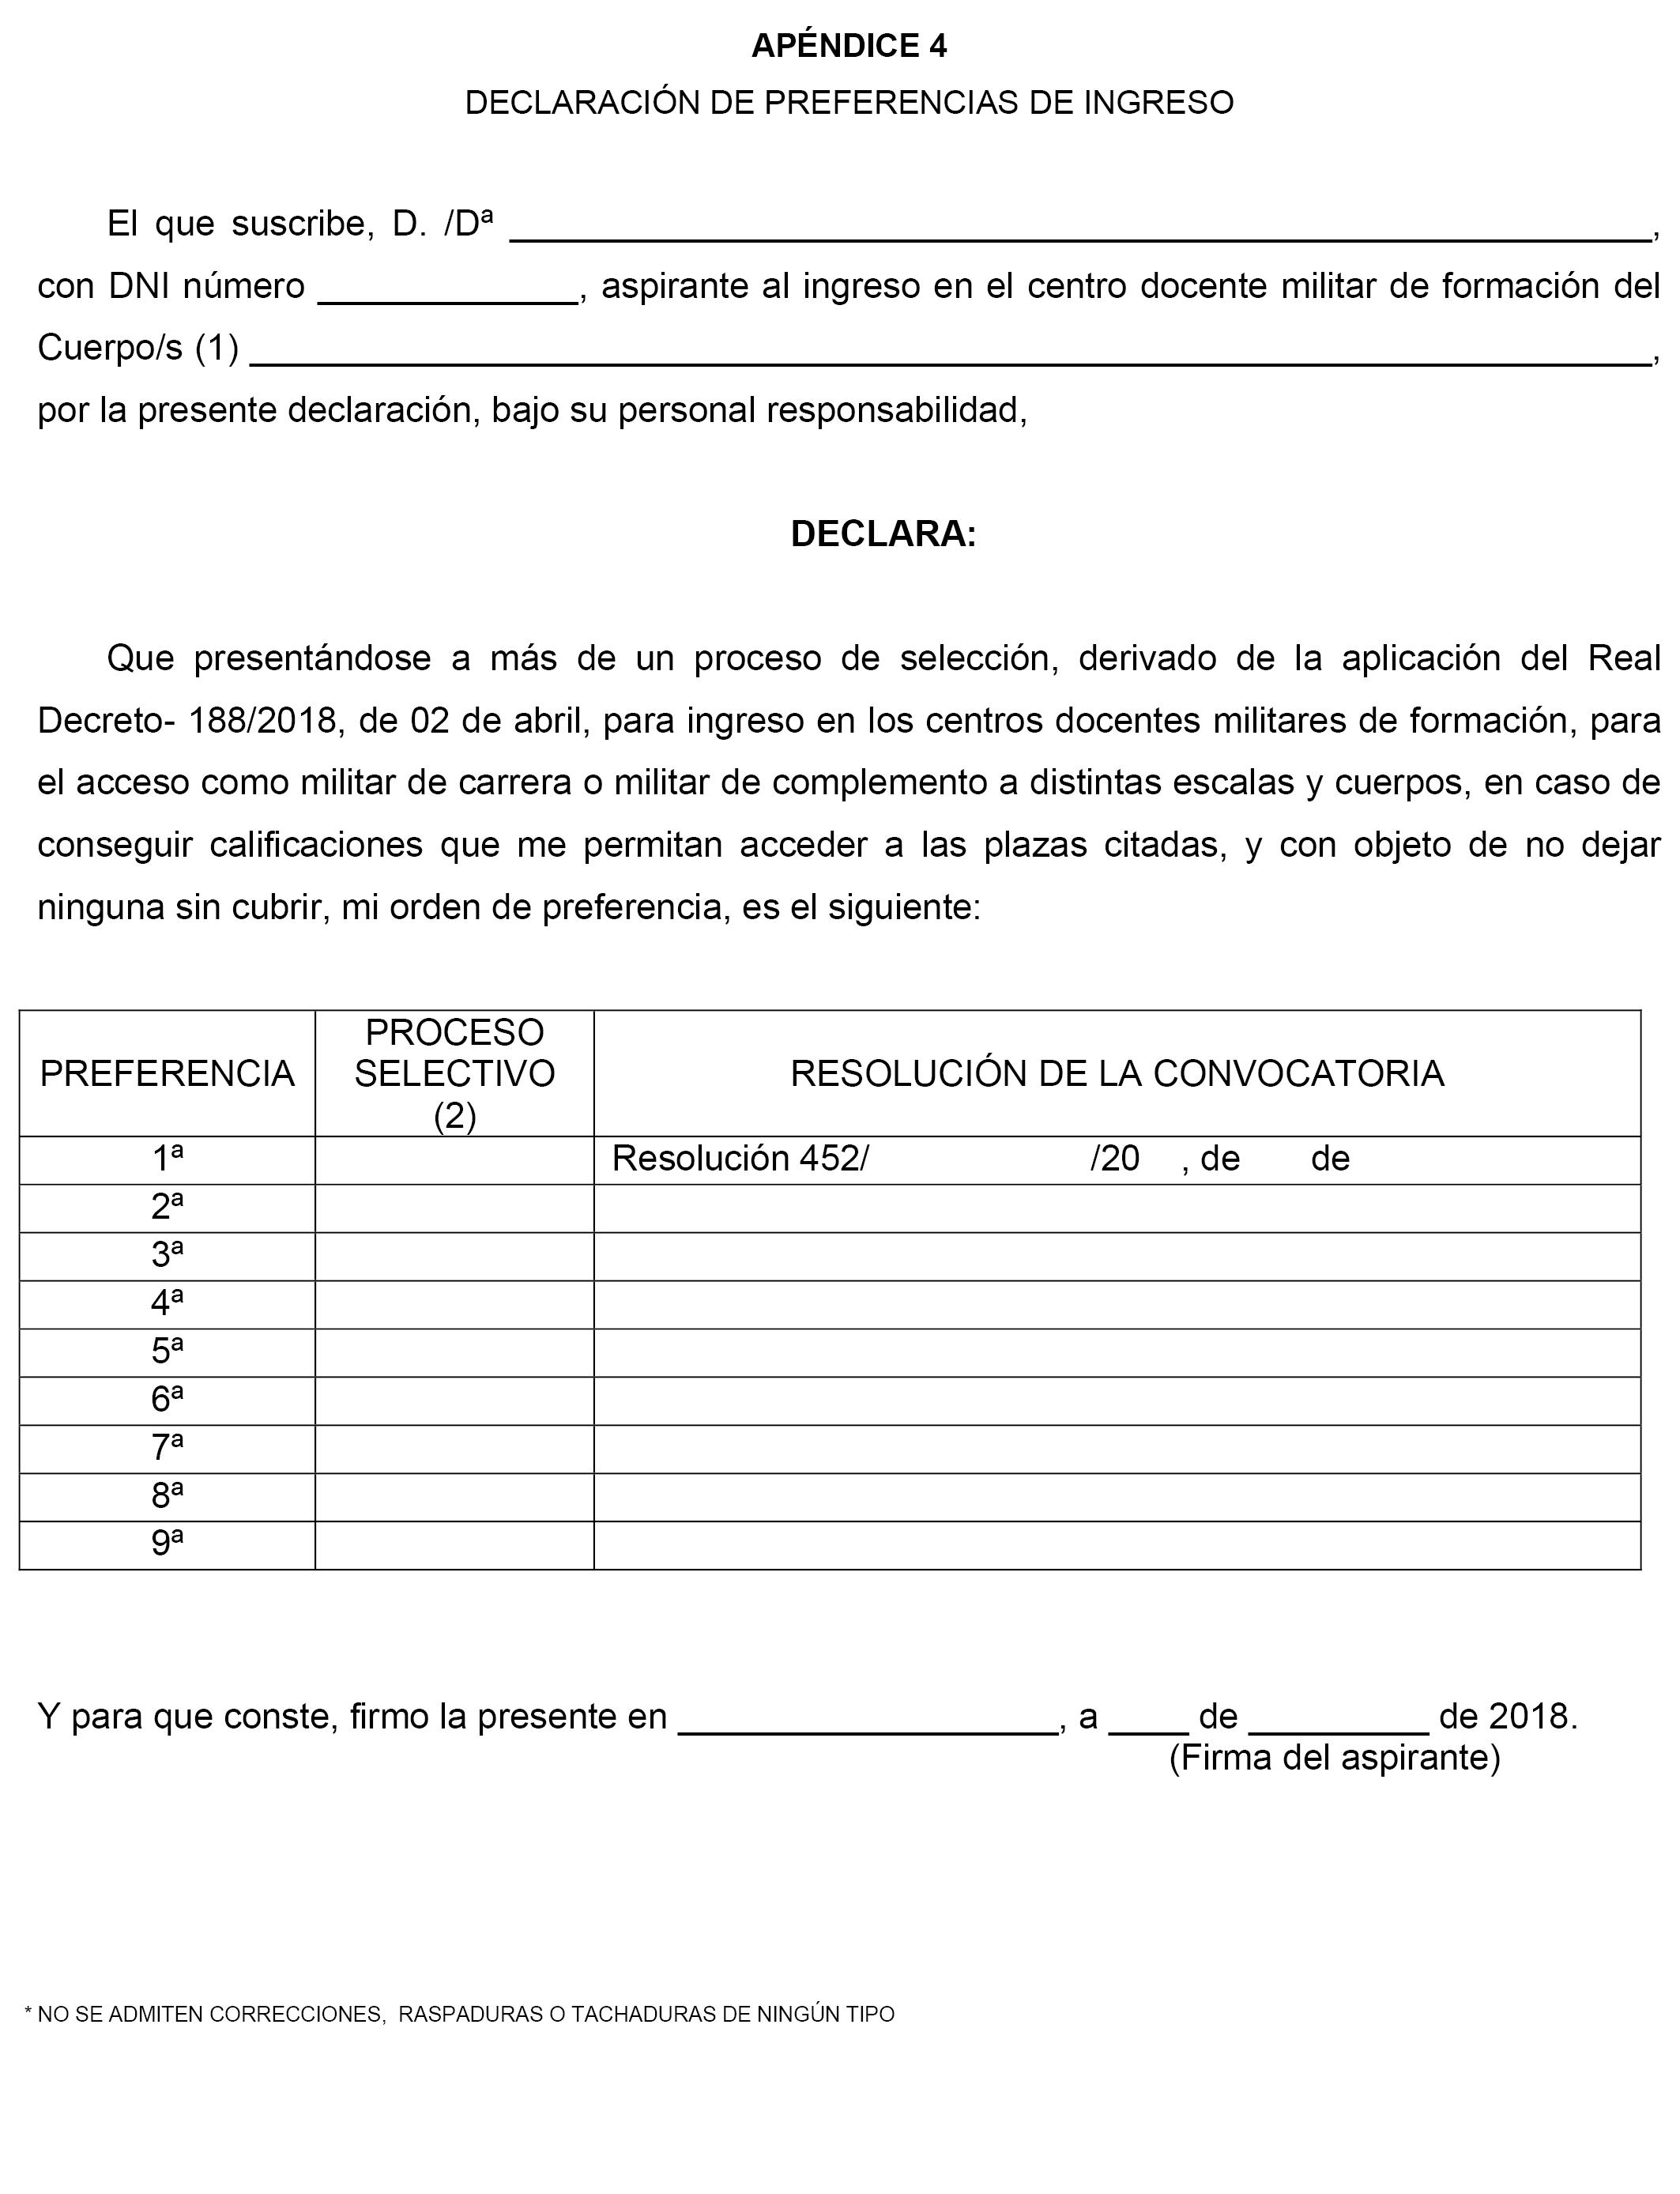 BOE.es - Documento BOE-A-2018-6731